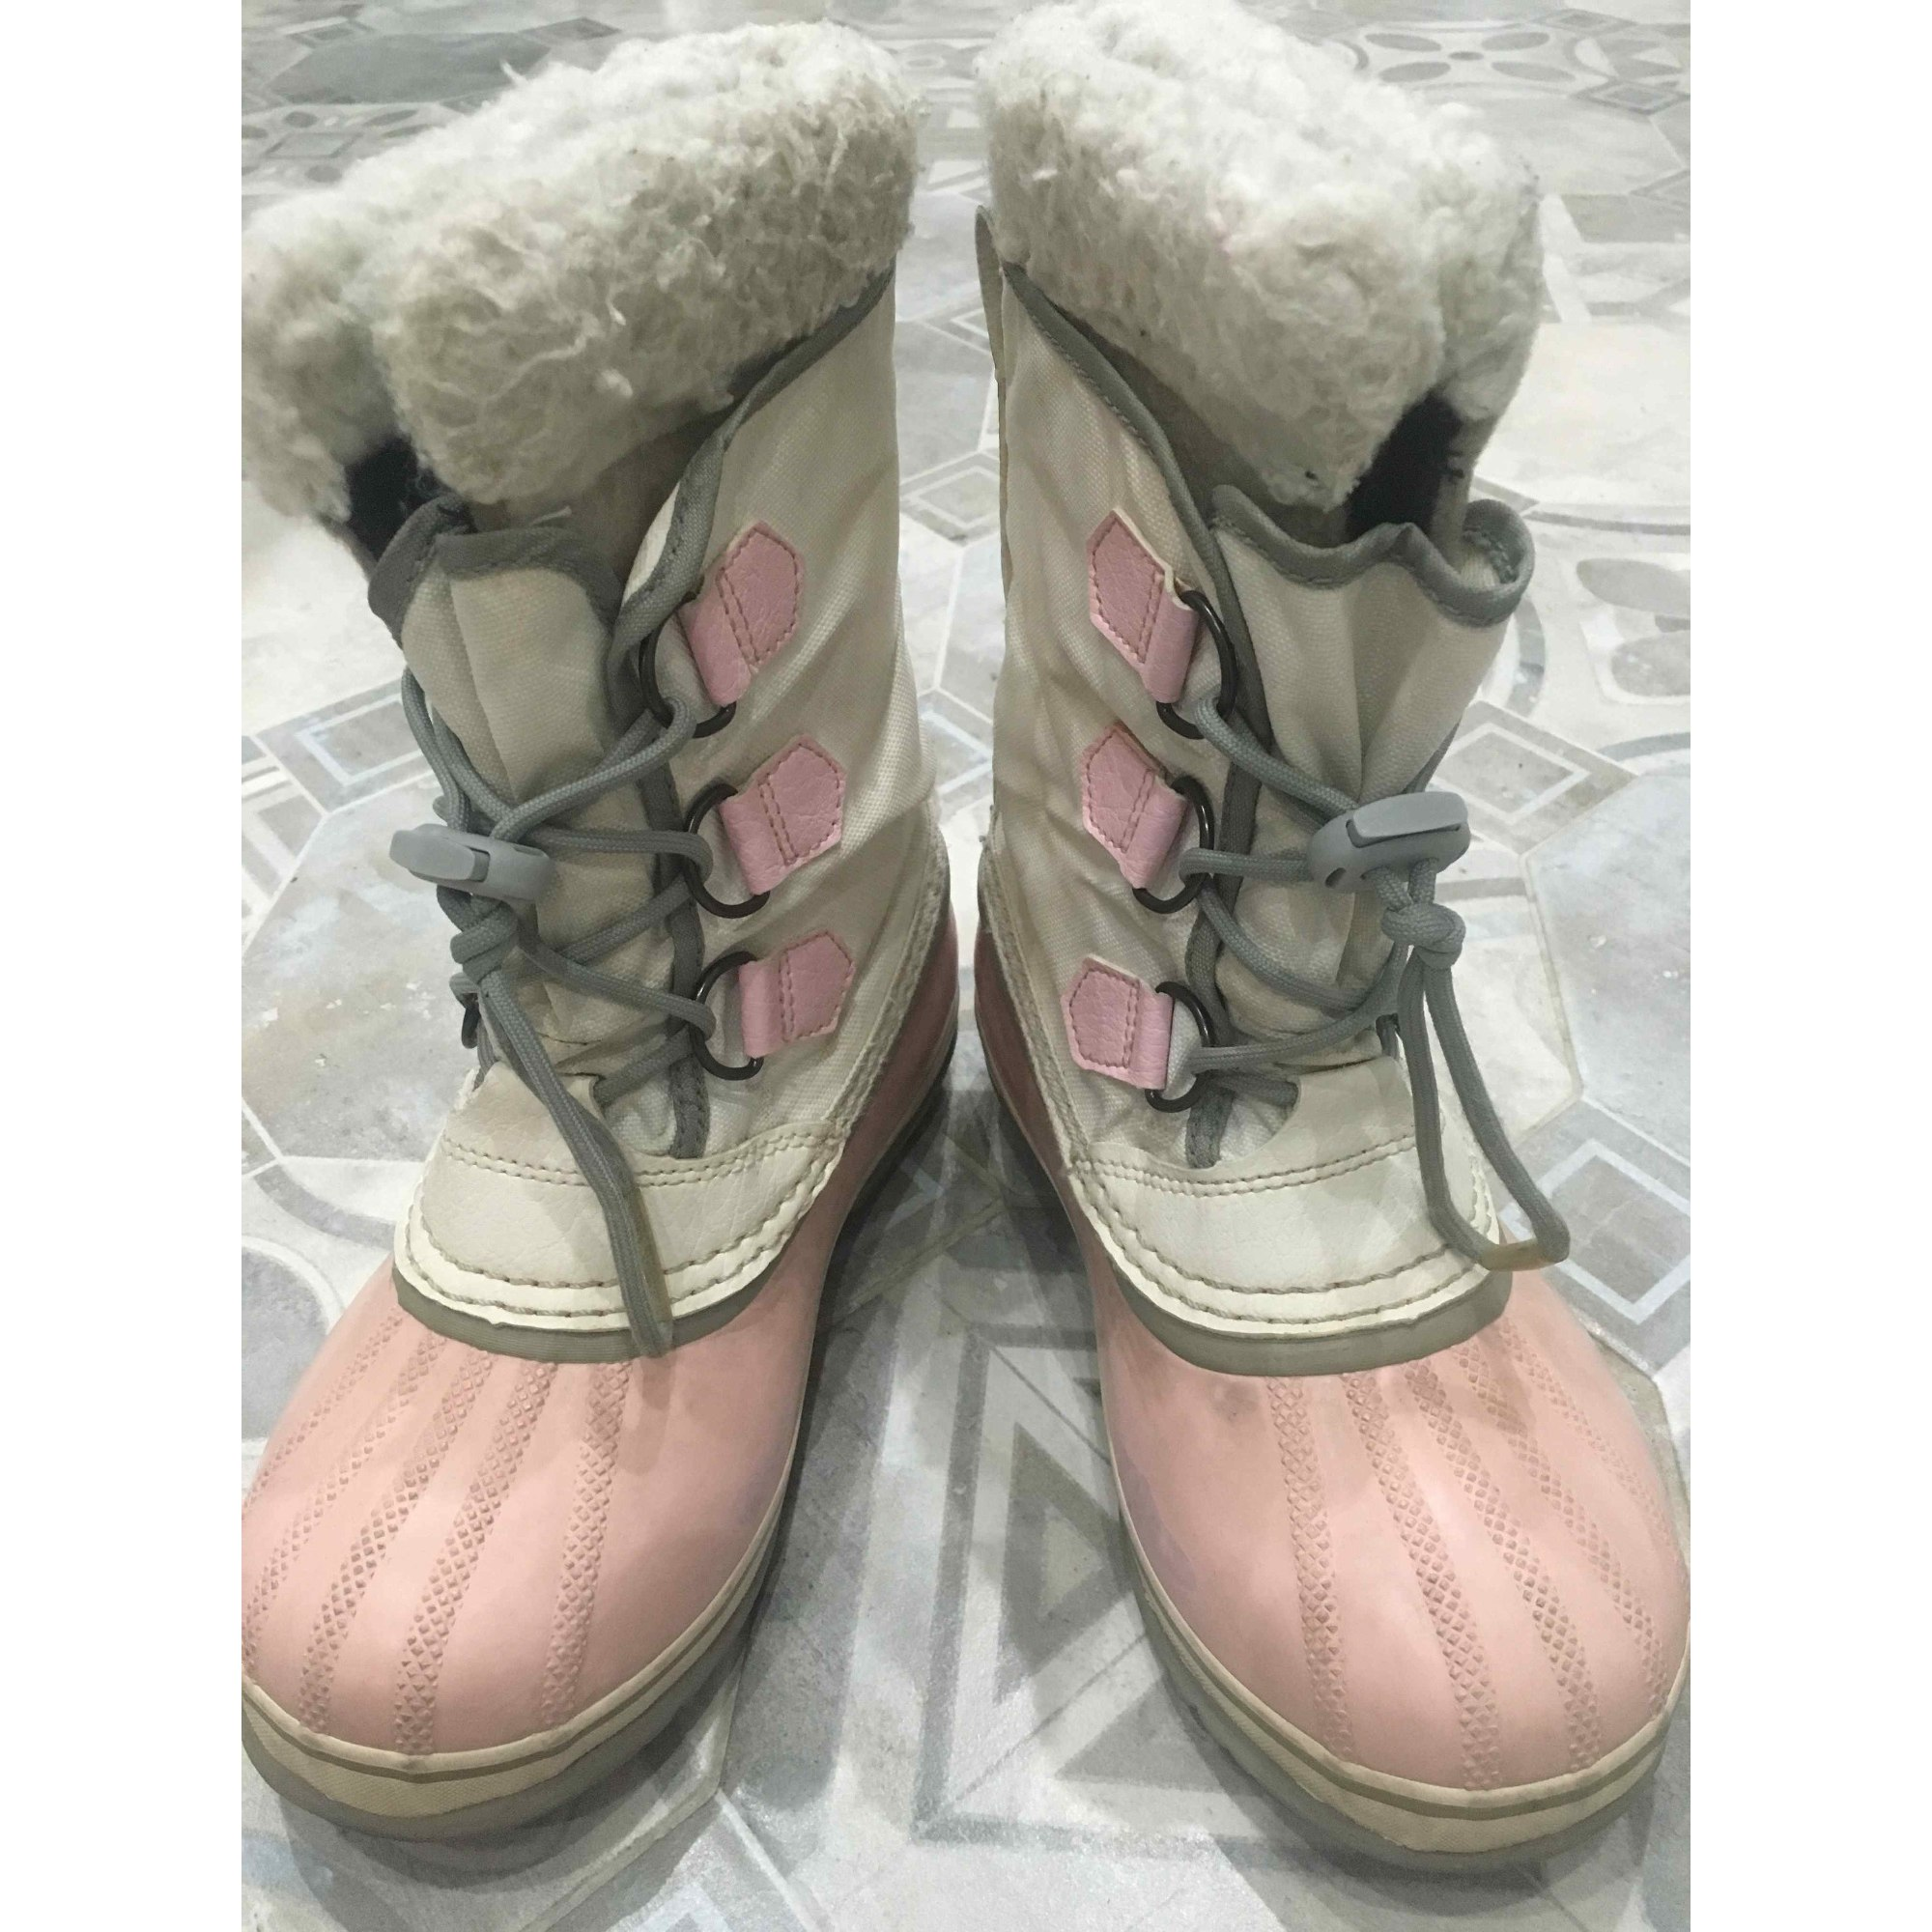 Bottes de neige SOREL simili cuir rose 34